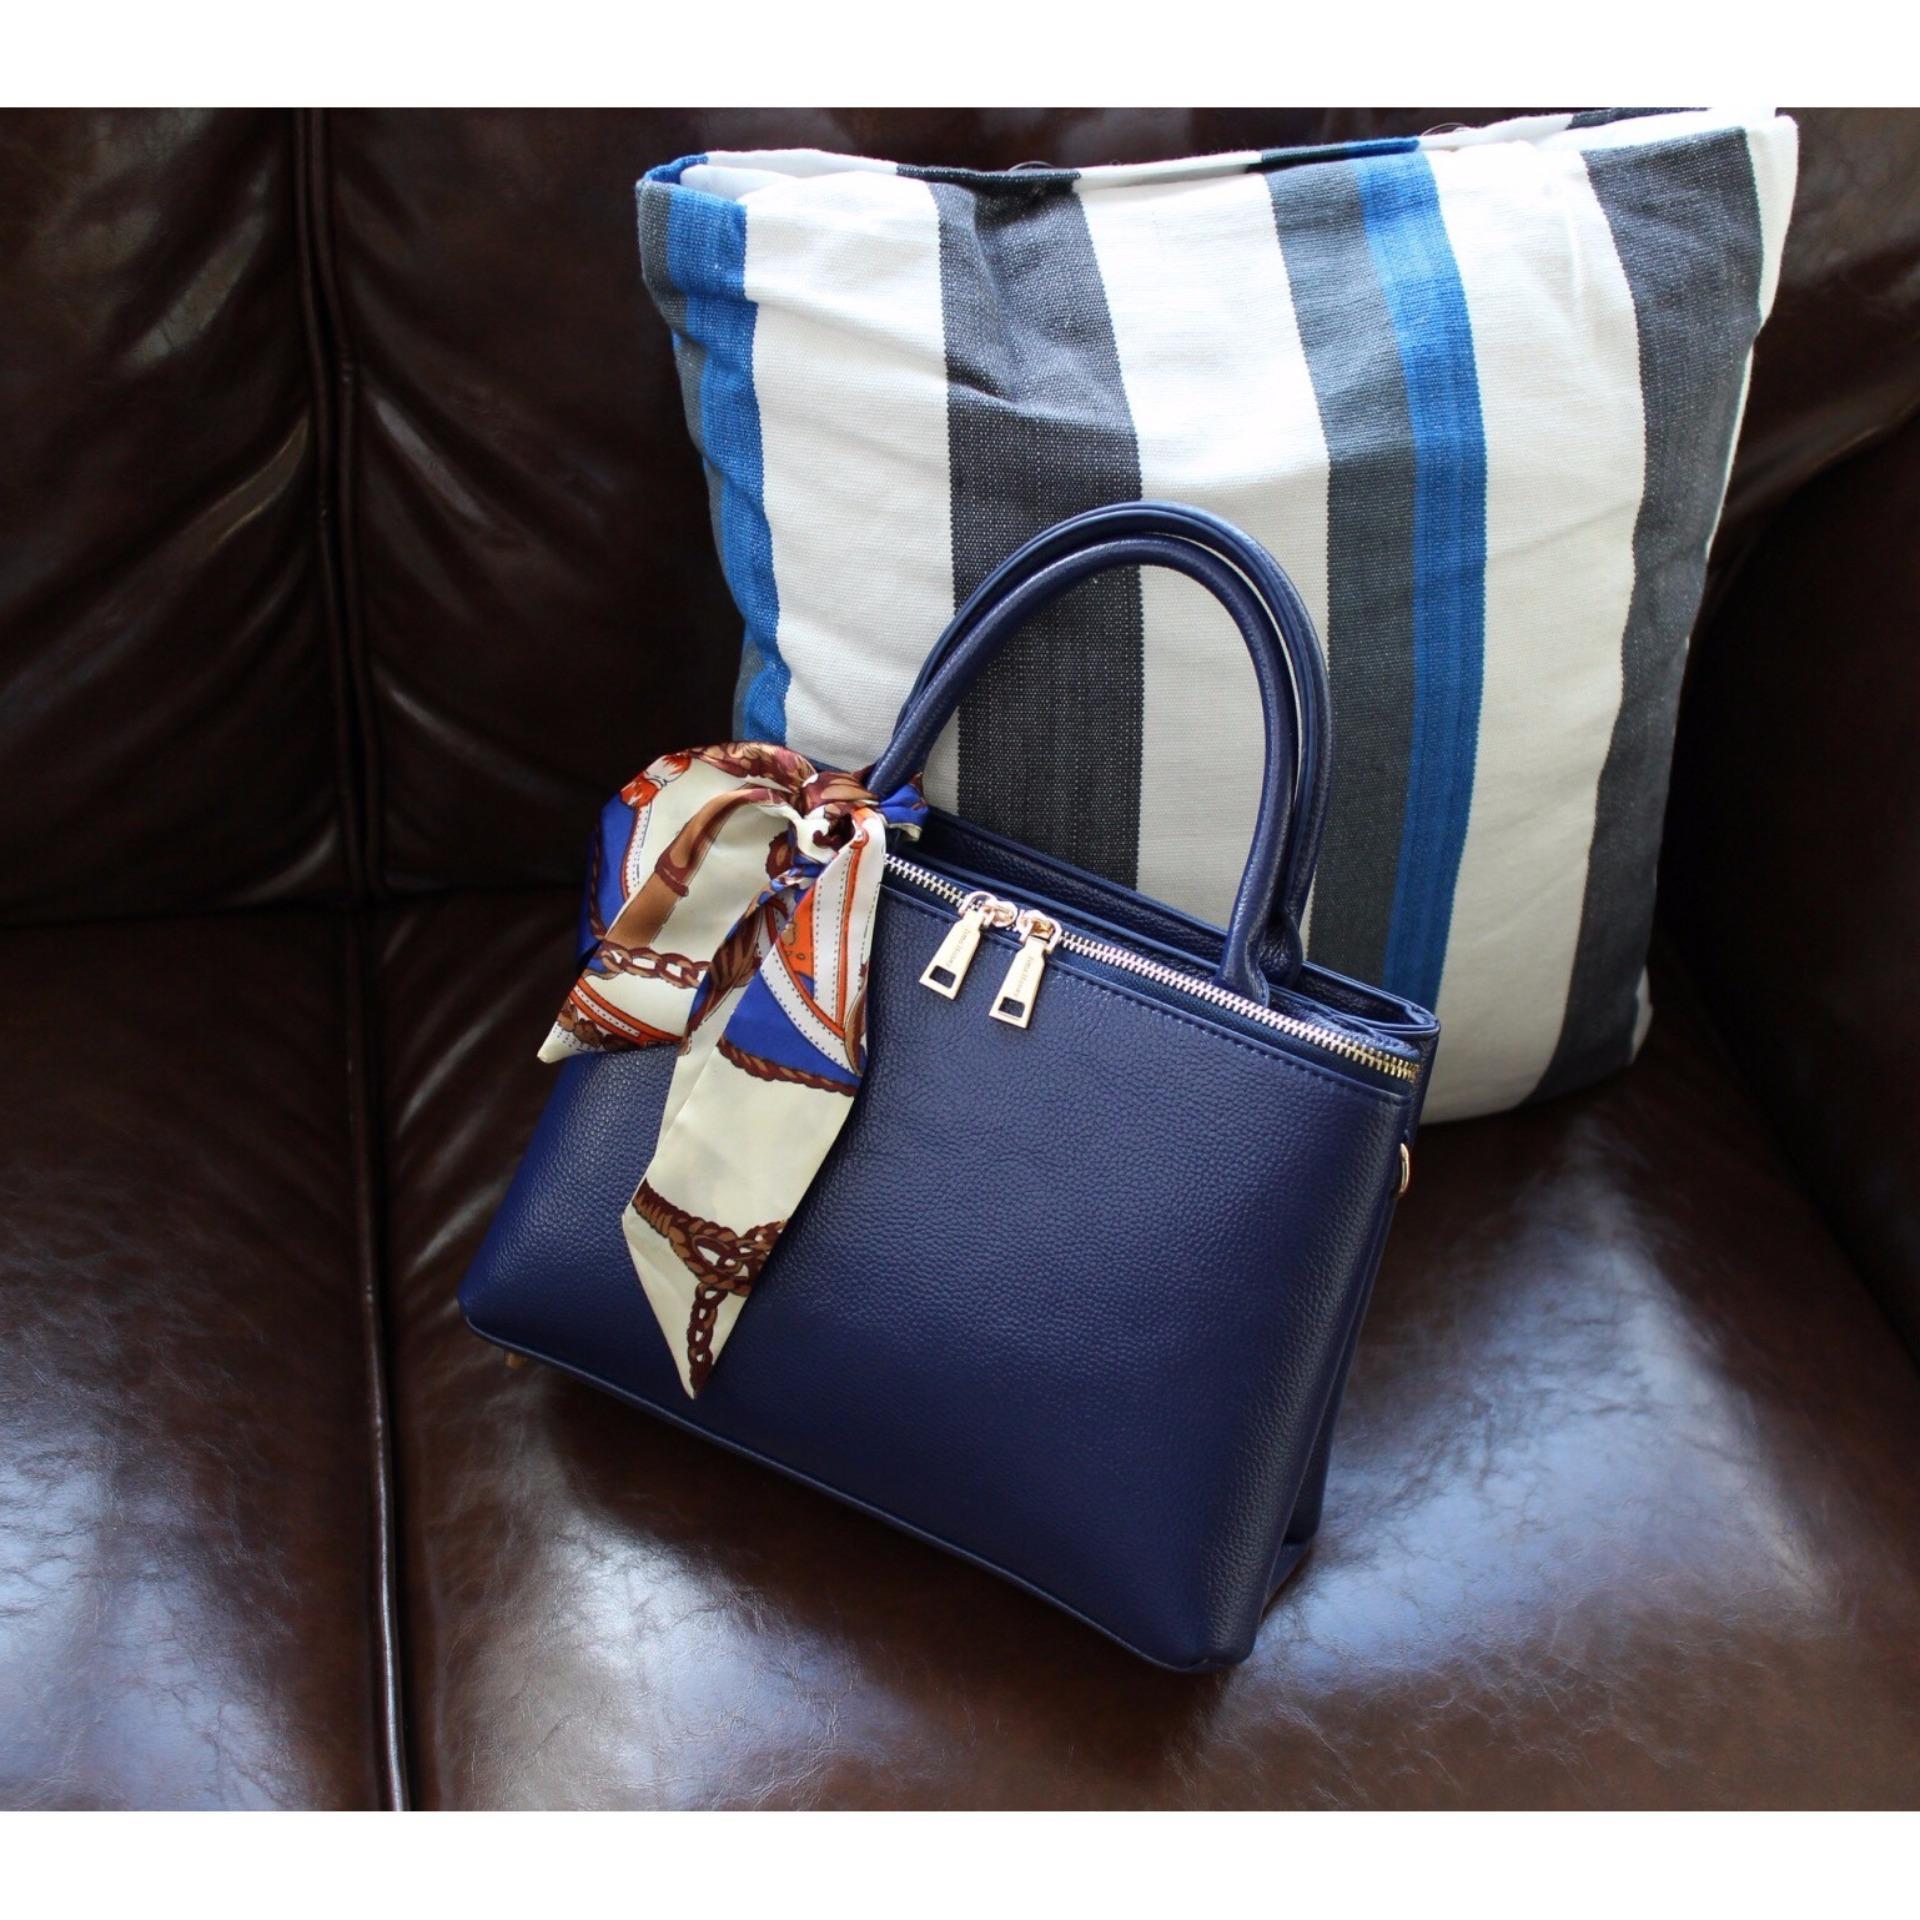 Harga Jimshoney Tas Handbag Wanita Talita Bag Navy Murah